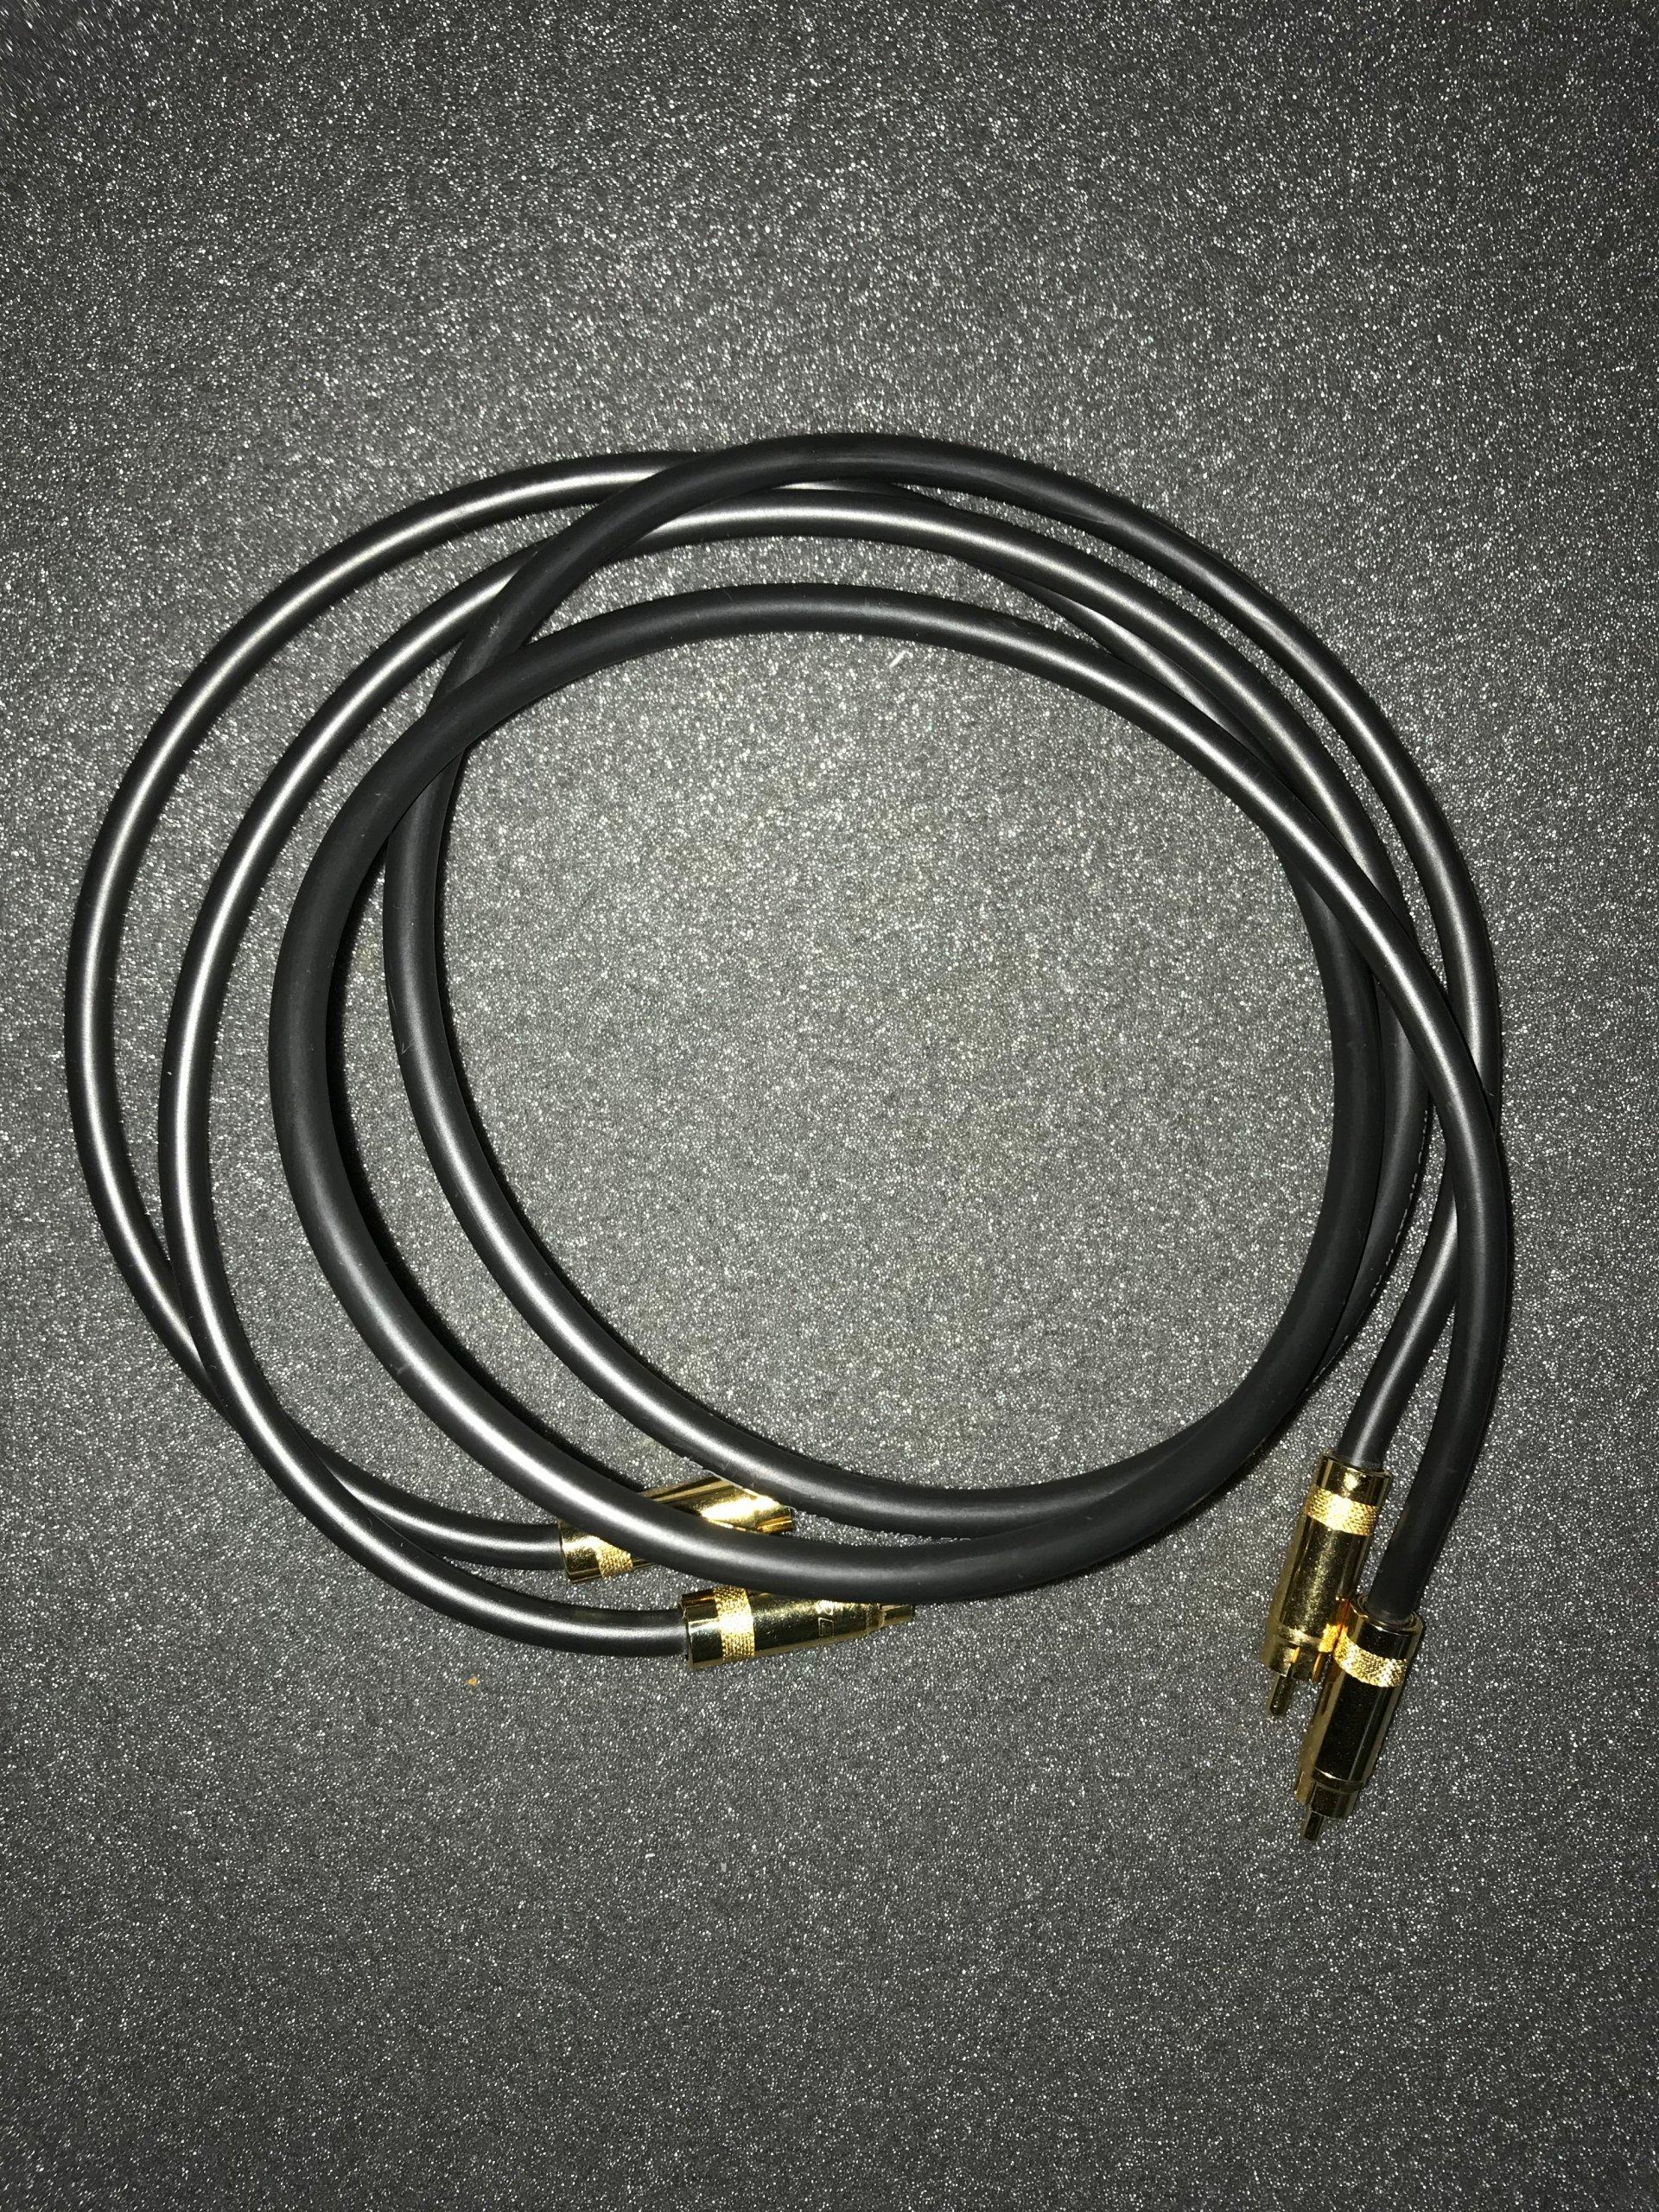 Kabel Interkonekt 2xRCA Klotz LY260 R-Audio 1m